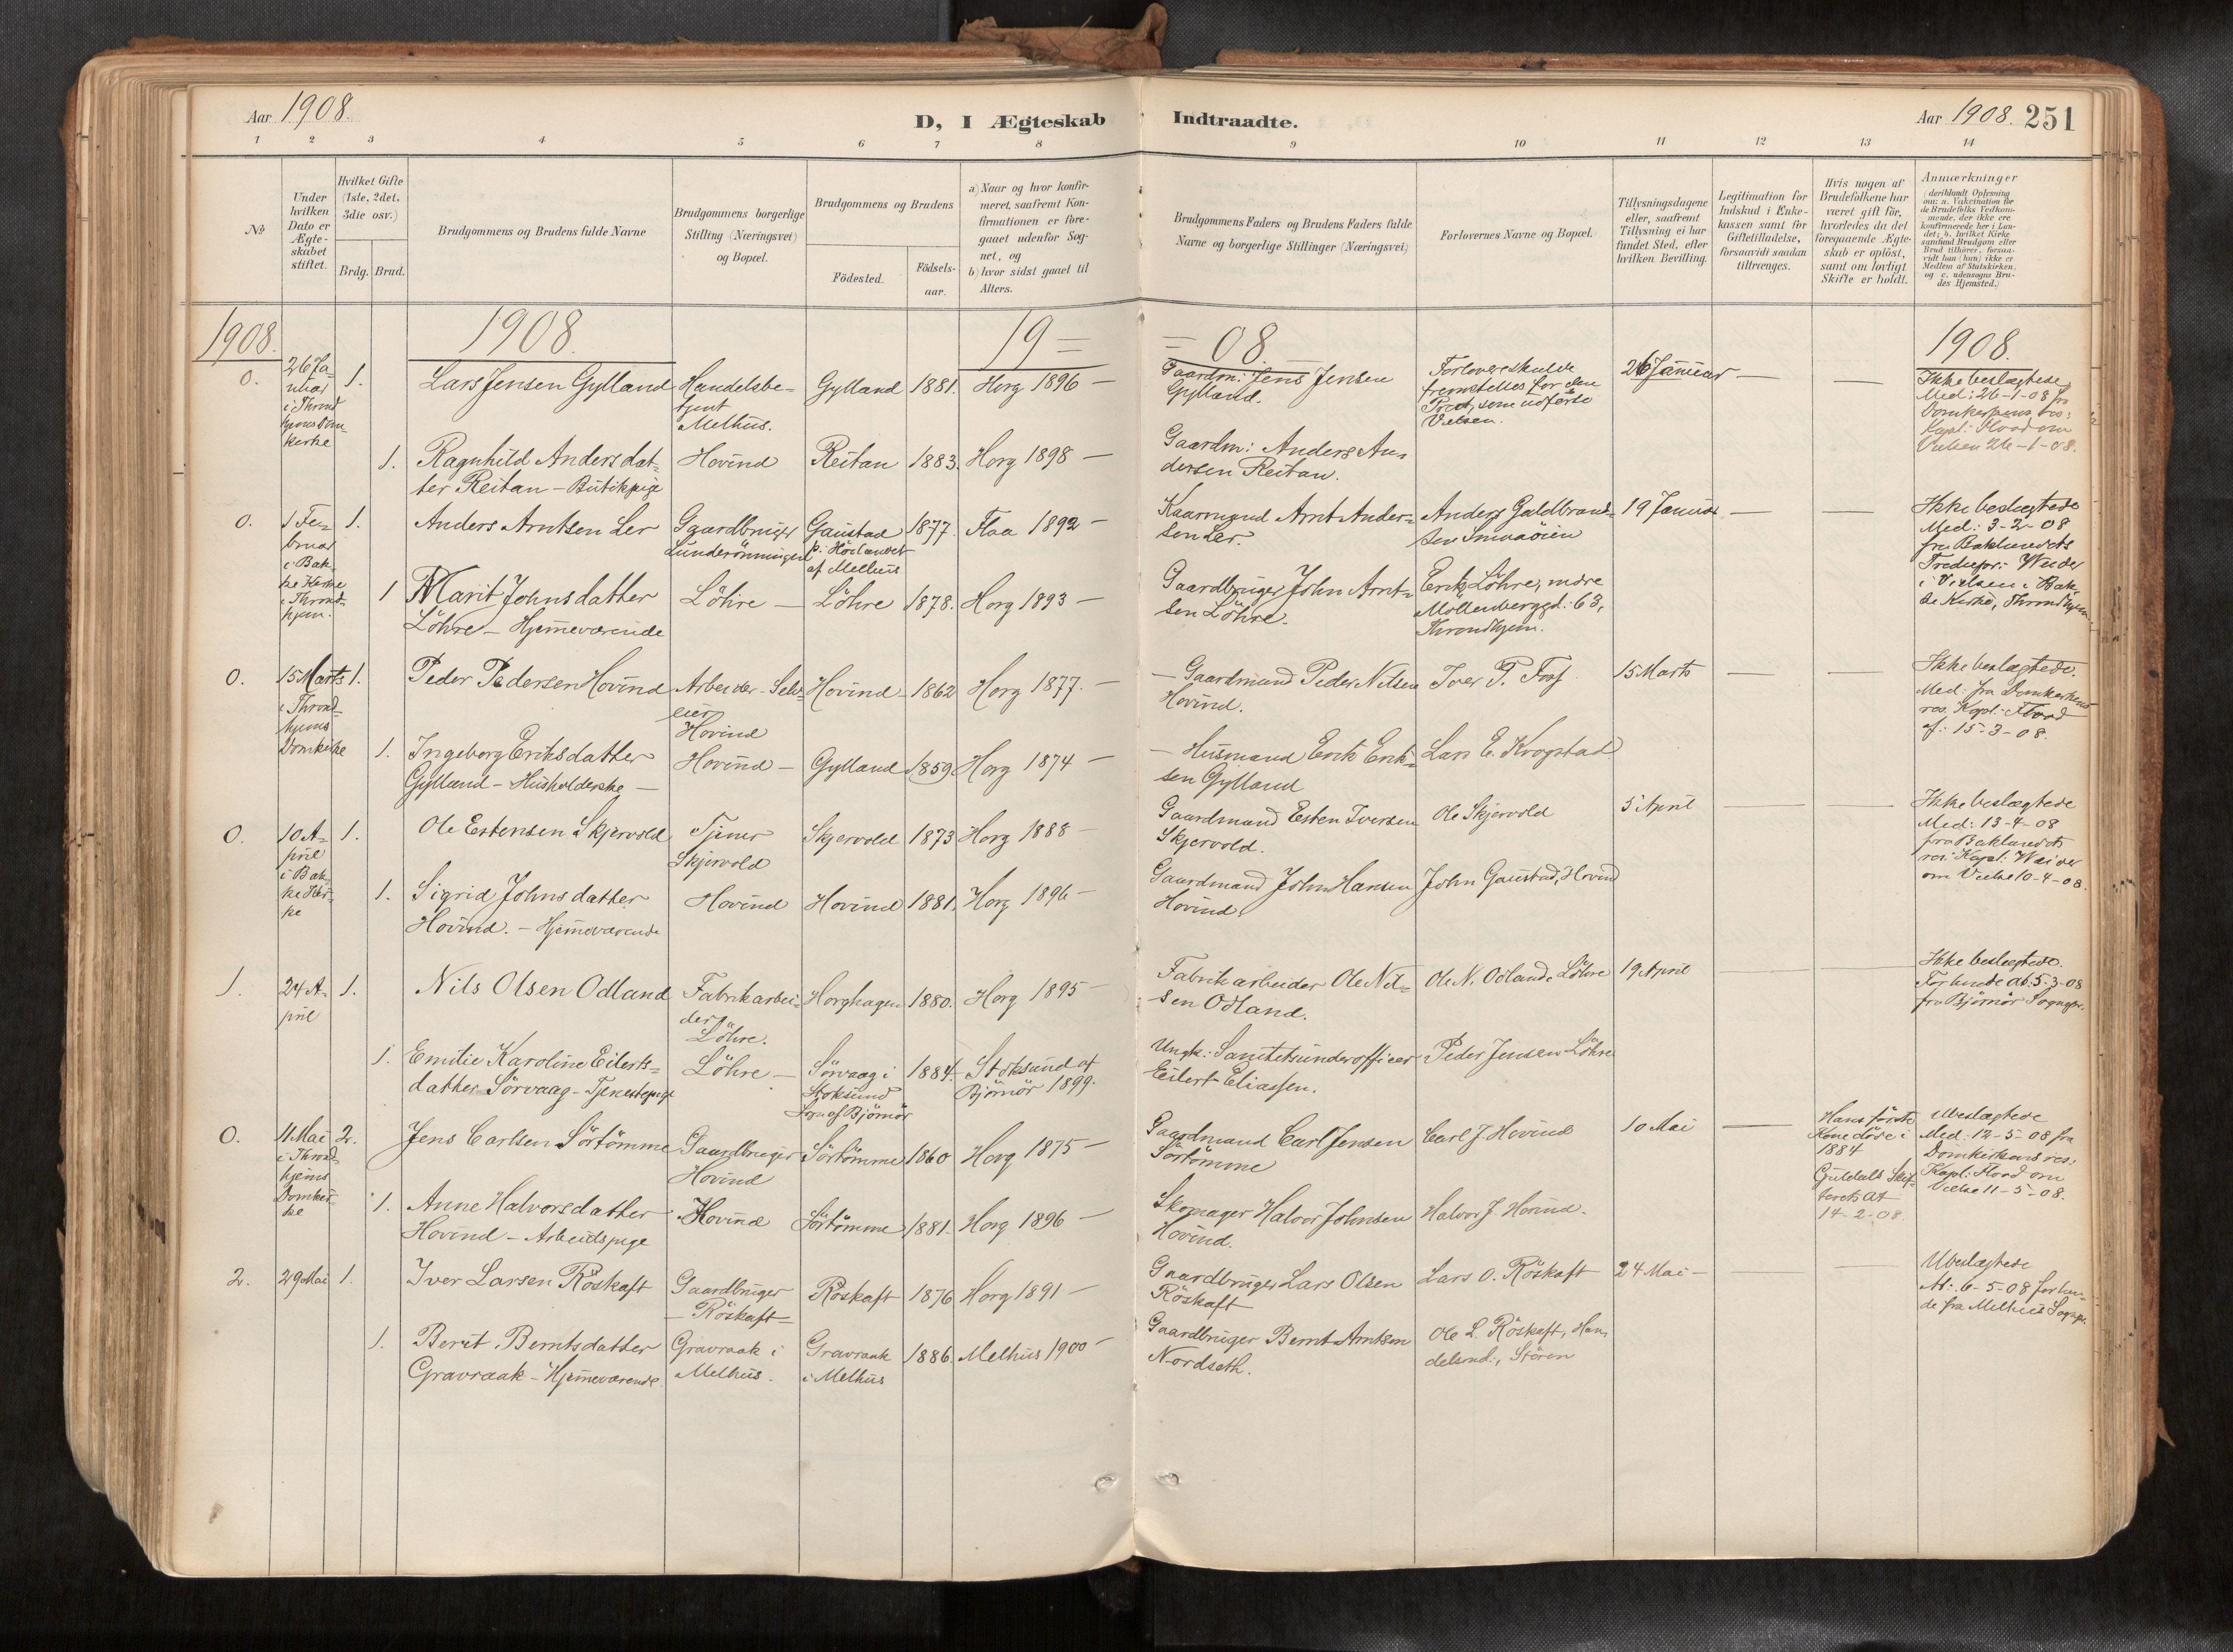 SAT, Ministerialprotokoller, klokkerbøker og fødselsregistre - Sør-Trøndelag, 692/L1105b: Parish register (official) no. 692A06, 1891-1934, p. 251